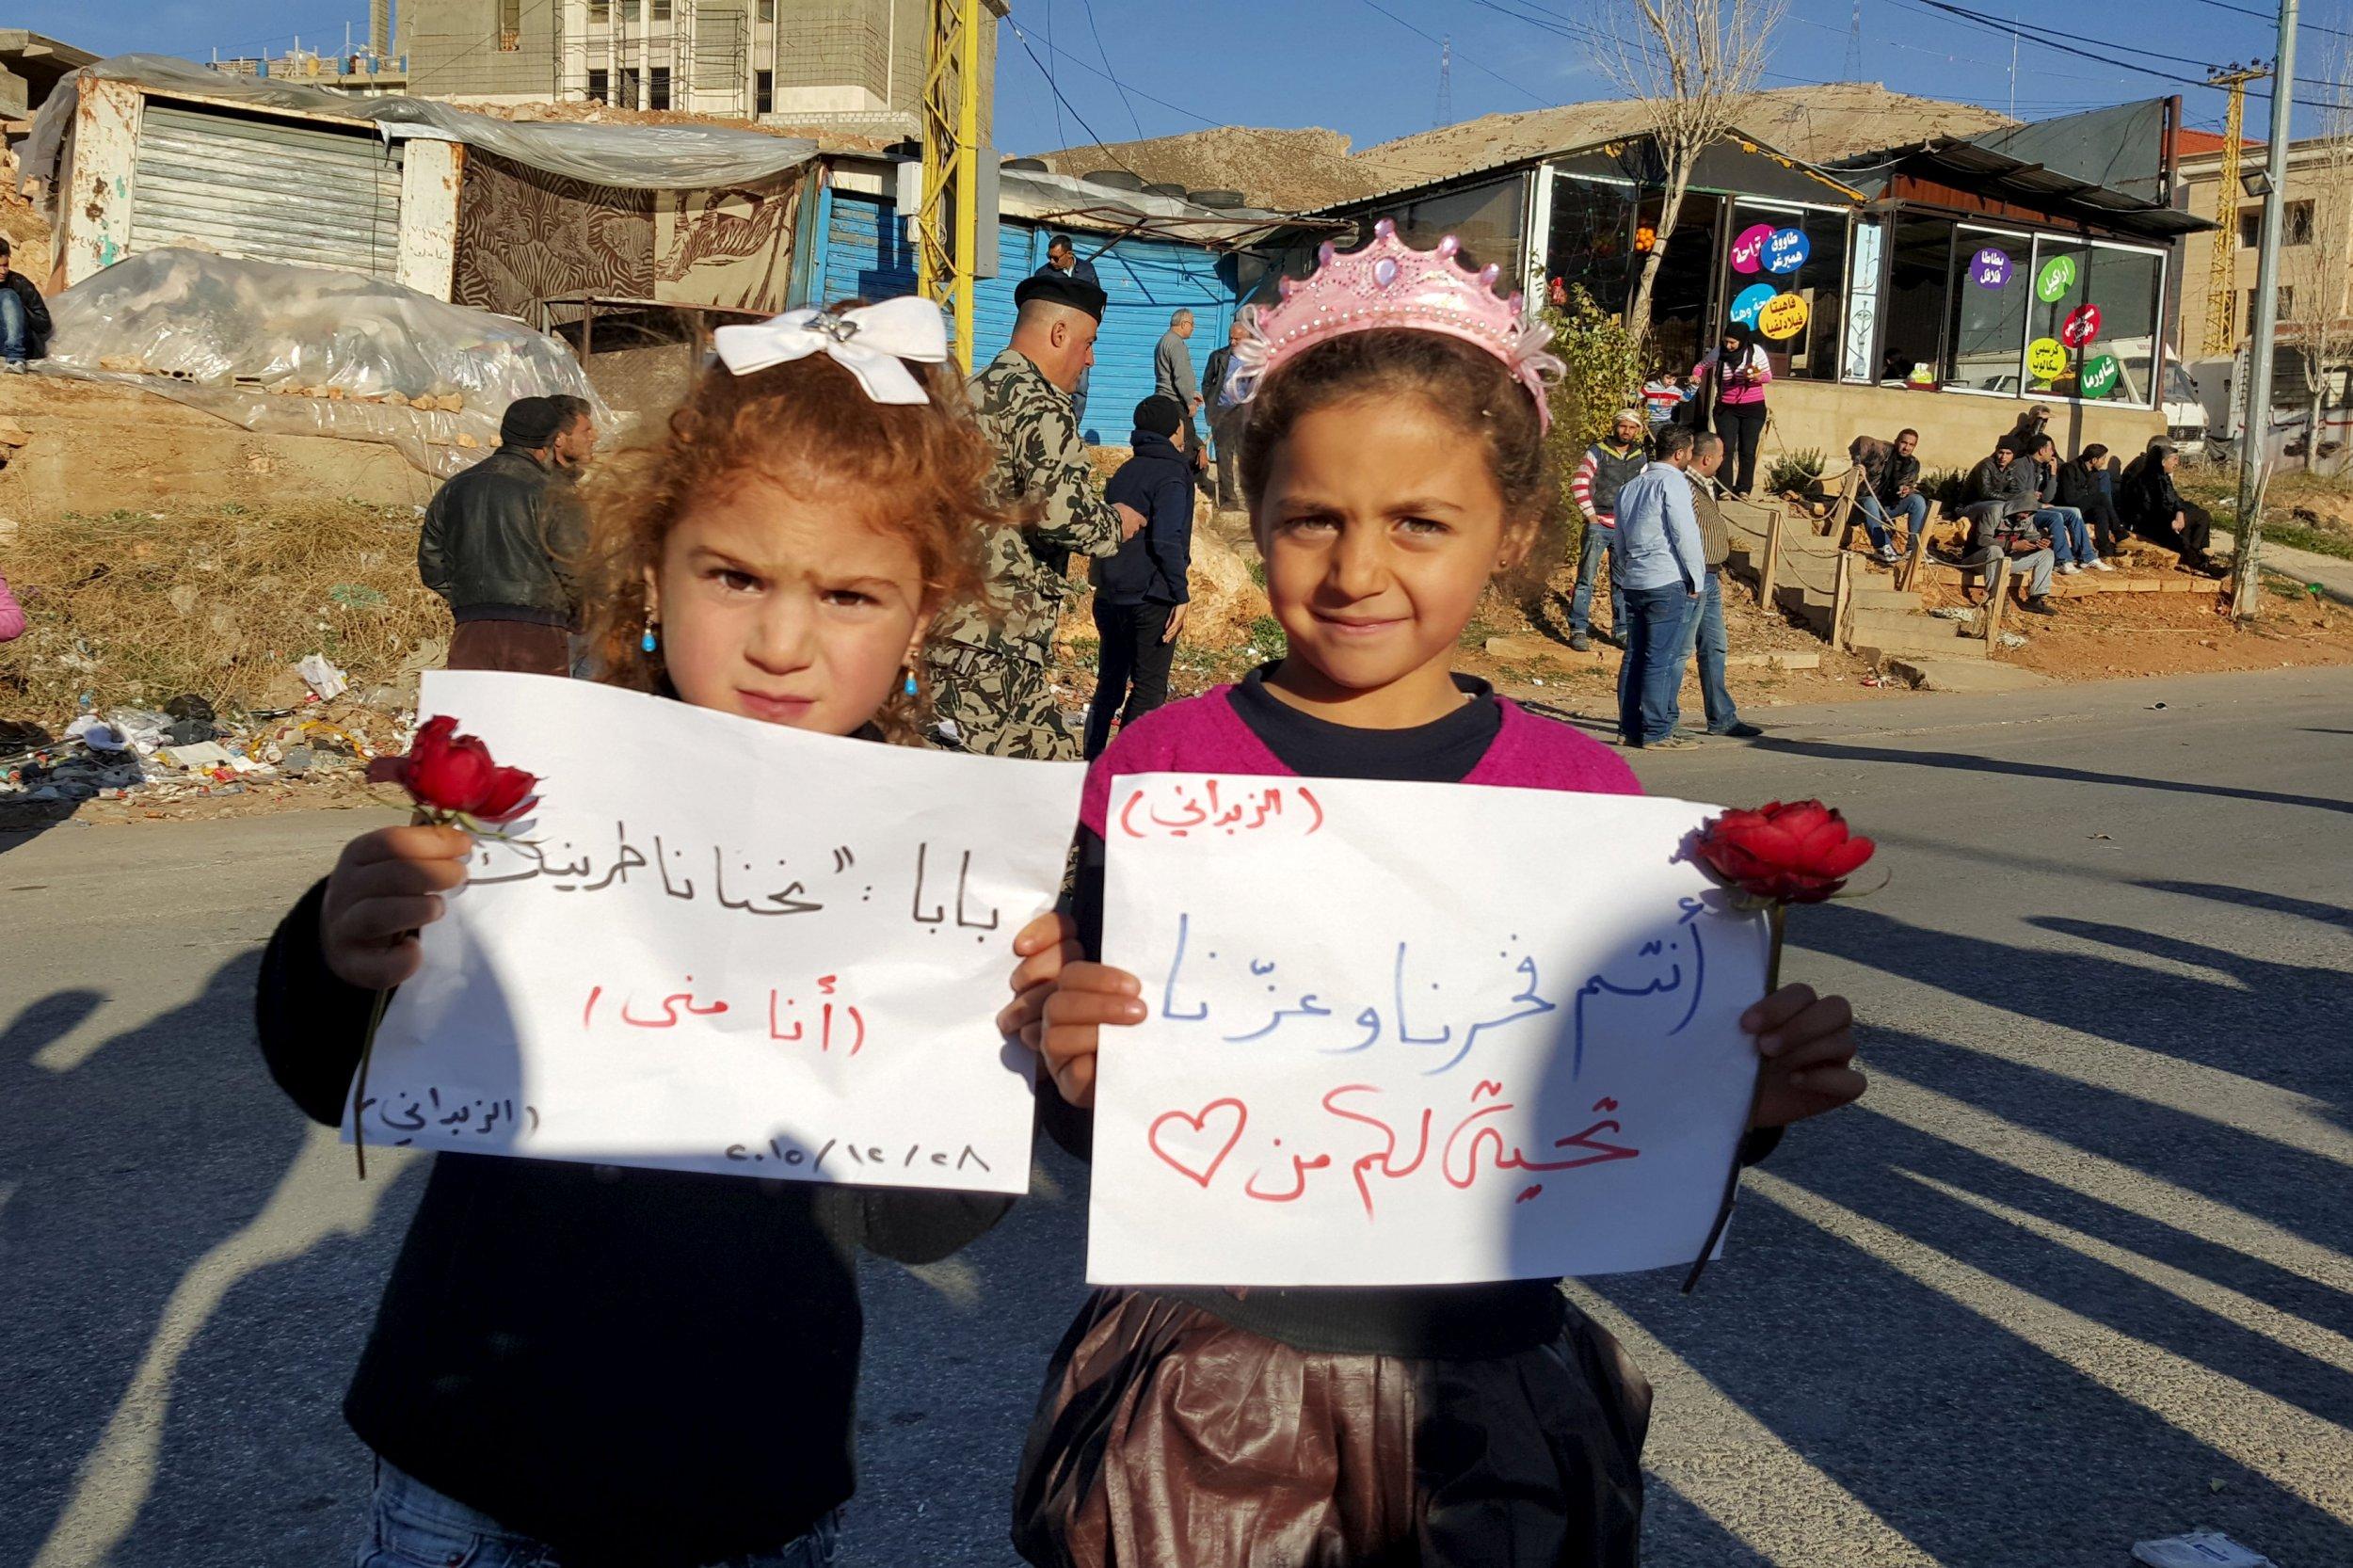 2015-12-28T173100Z_2_LYNXMPEBBR0K1_RTROPTP_4_MIDEAST-CRISIS-SYRIA-EVACUATION